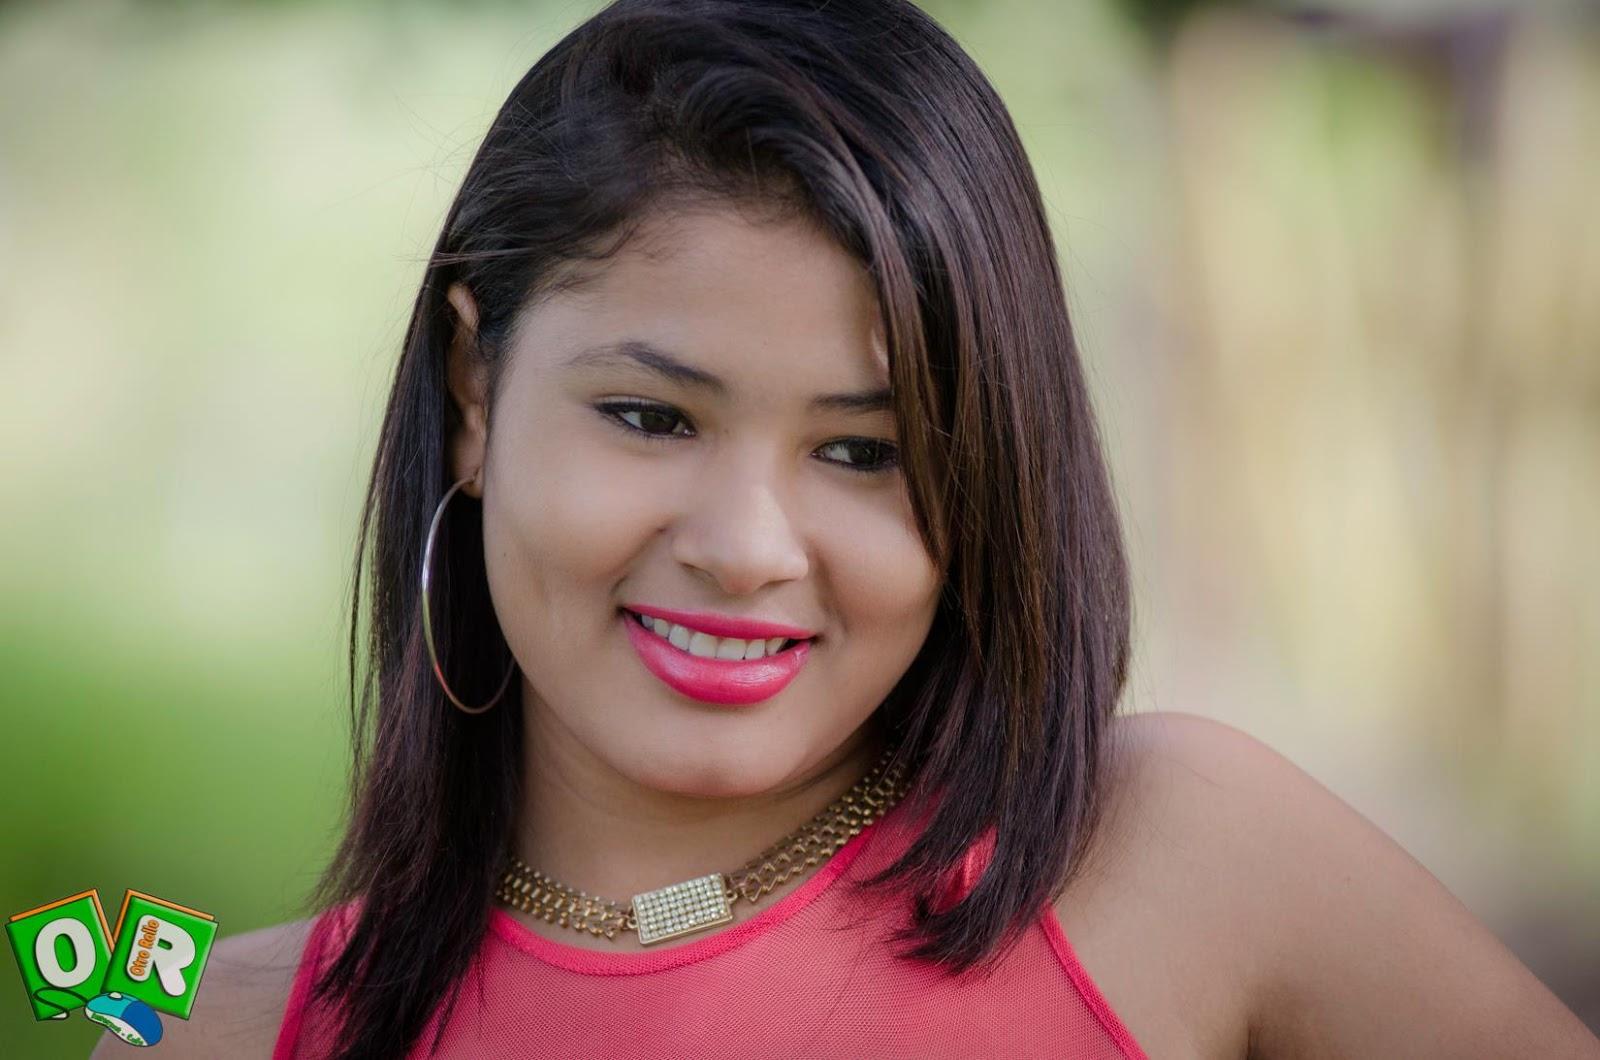 Mujeres Solteras Inteligentes Fiestera - 876915